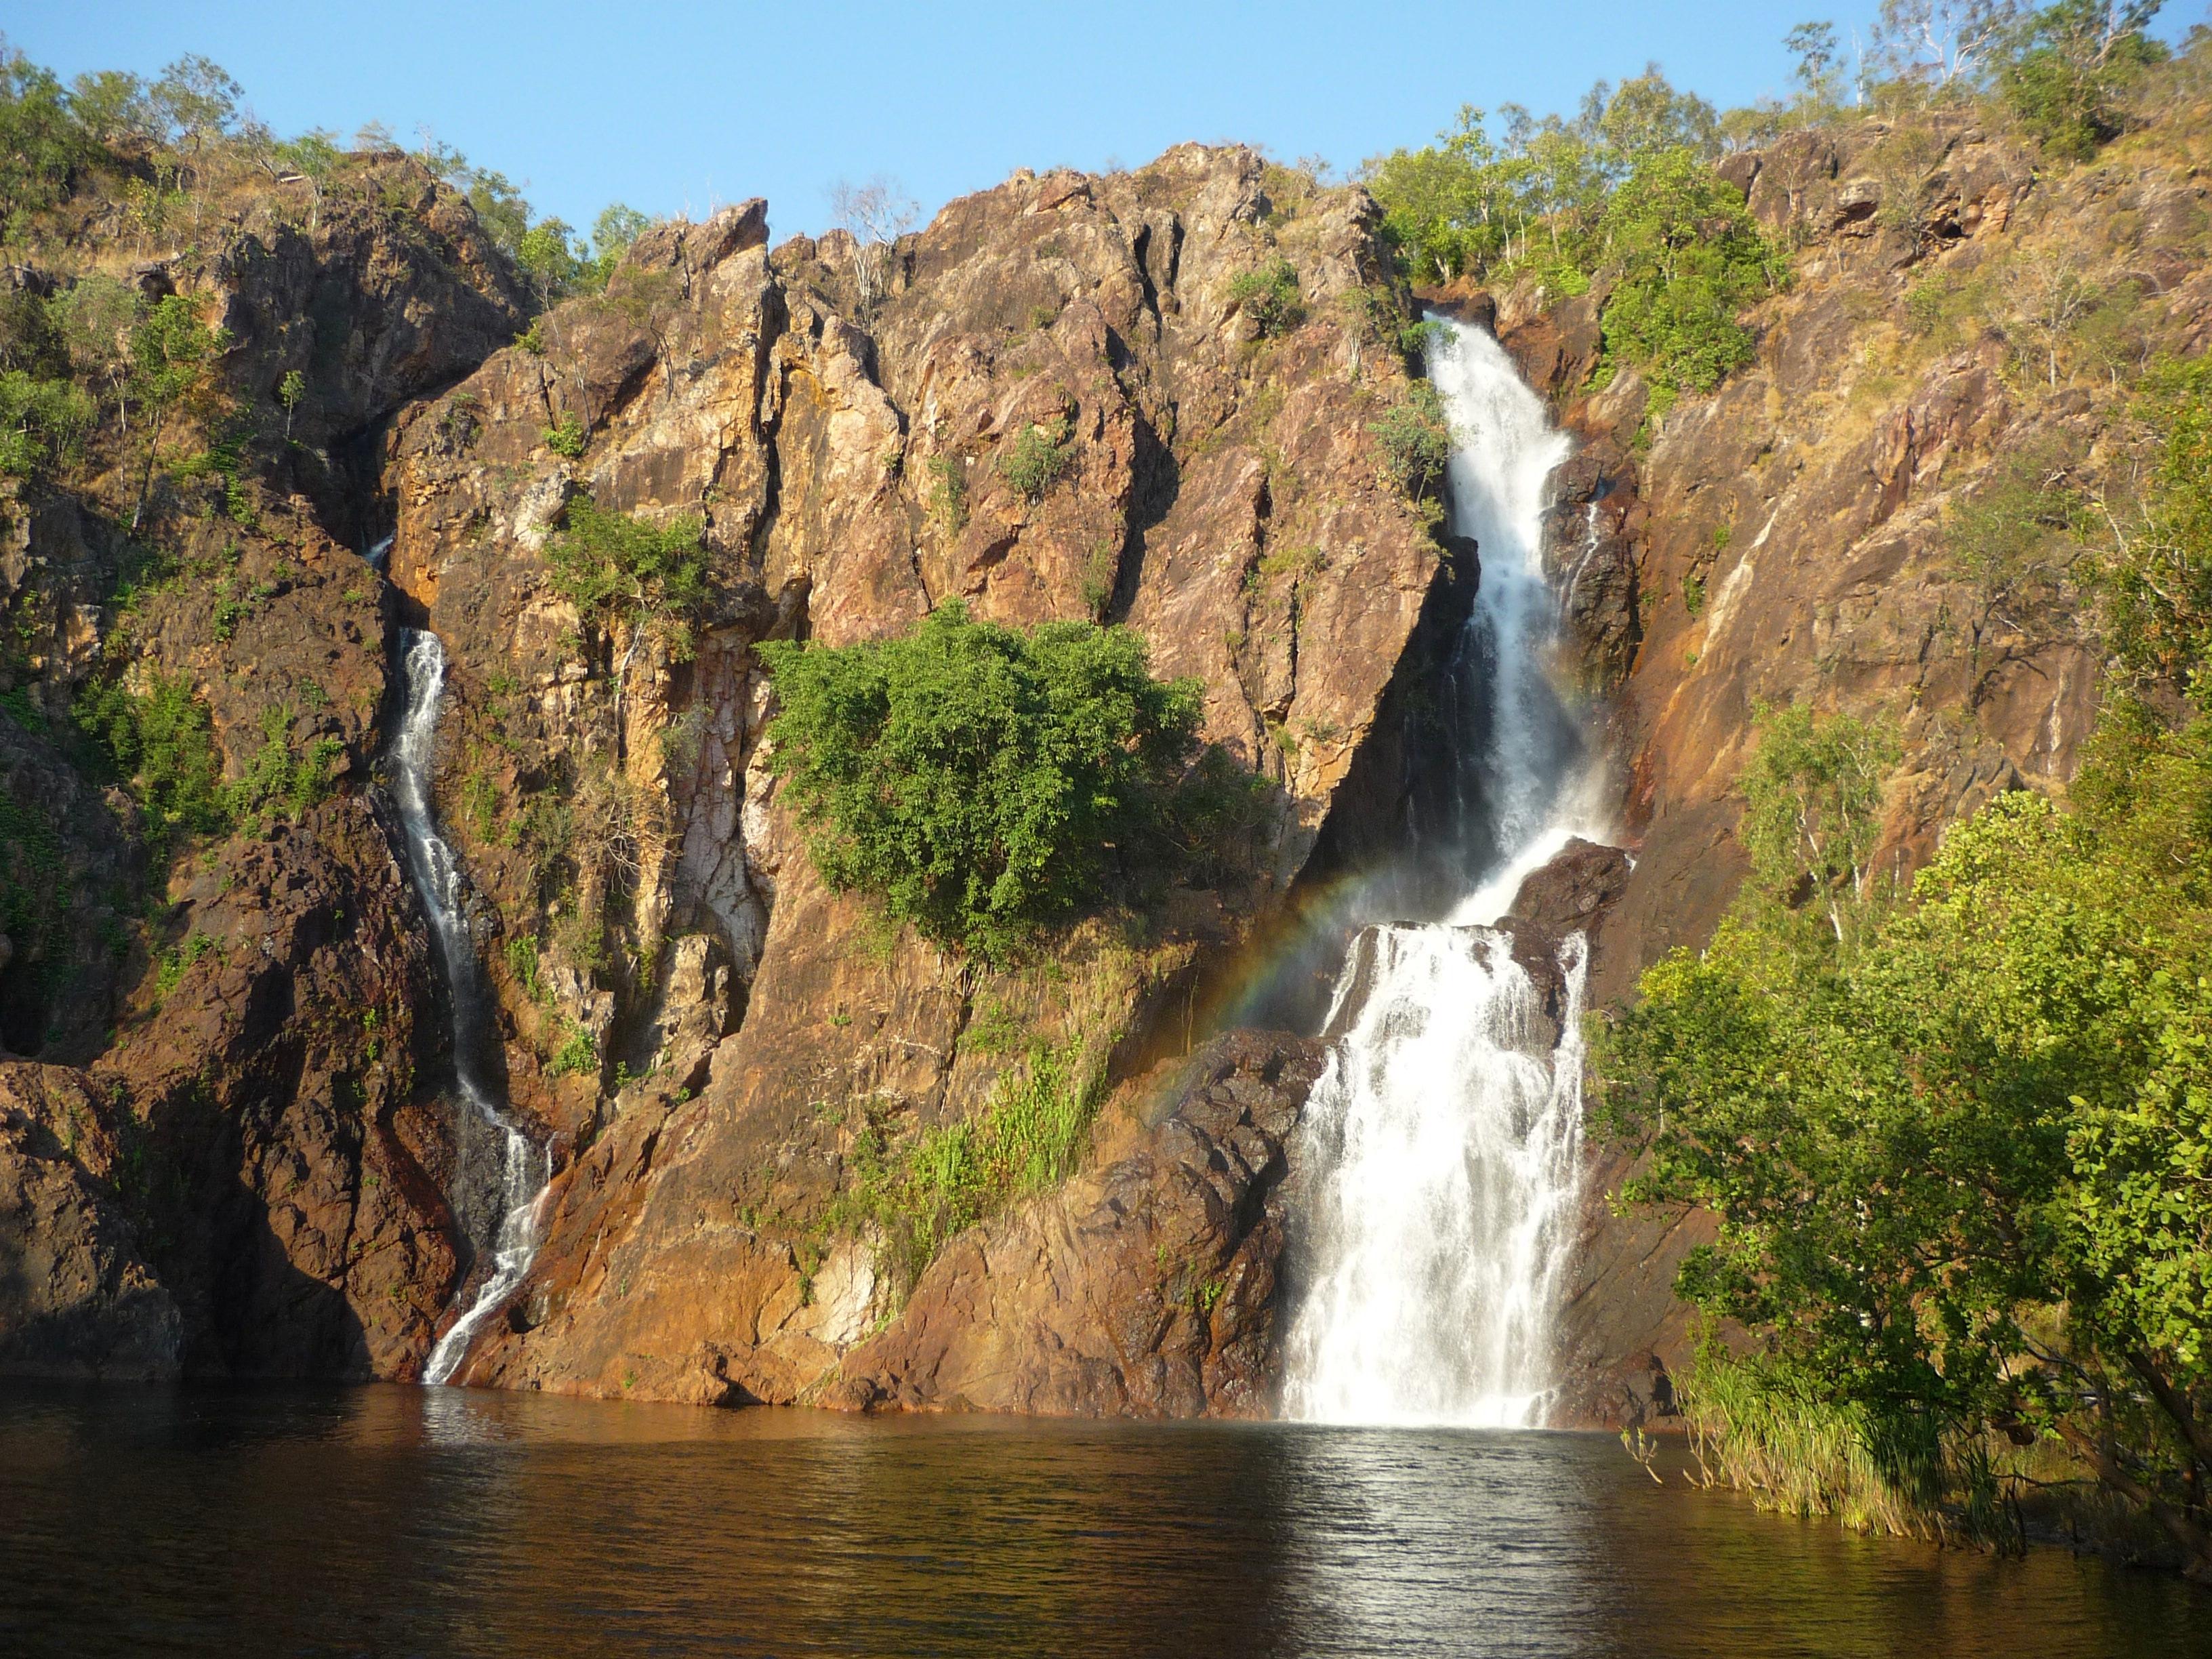 Wangi falls in National park